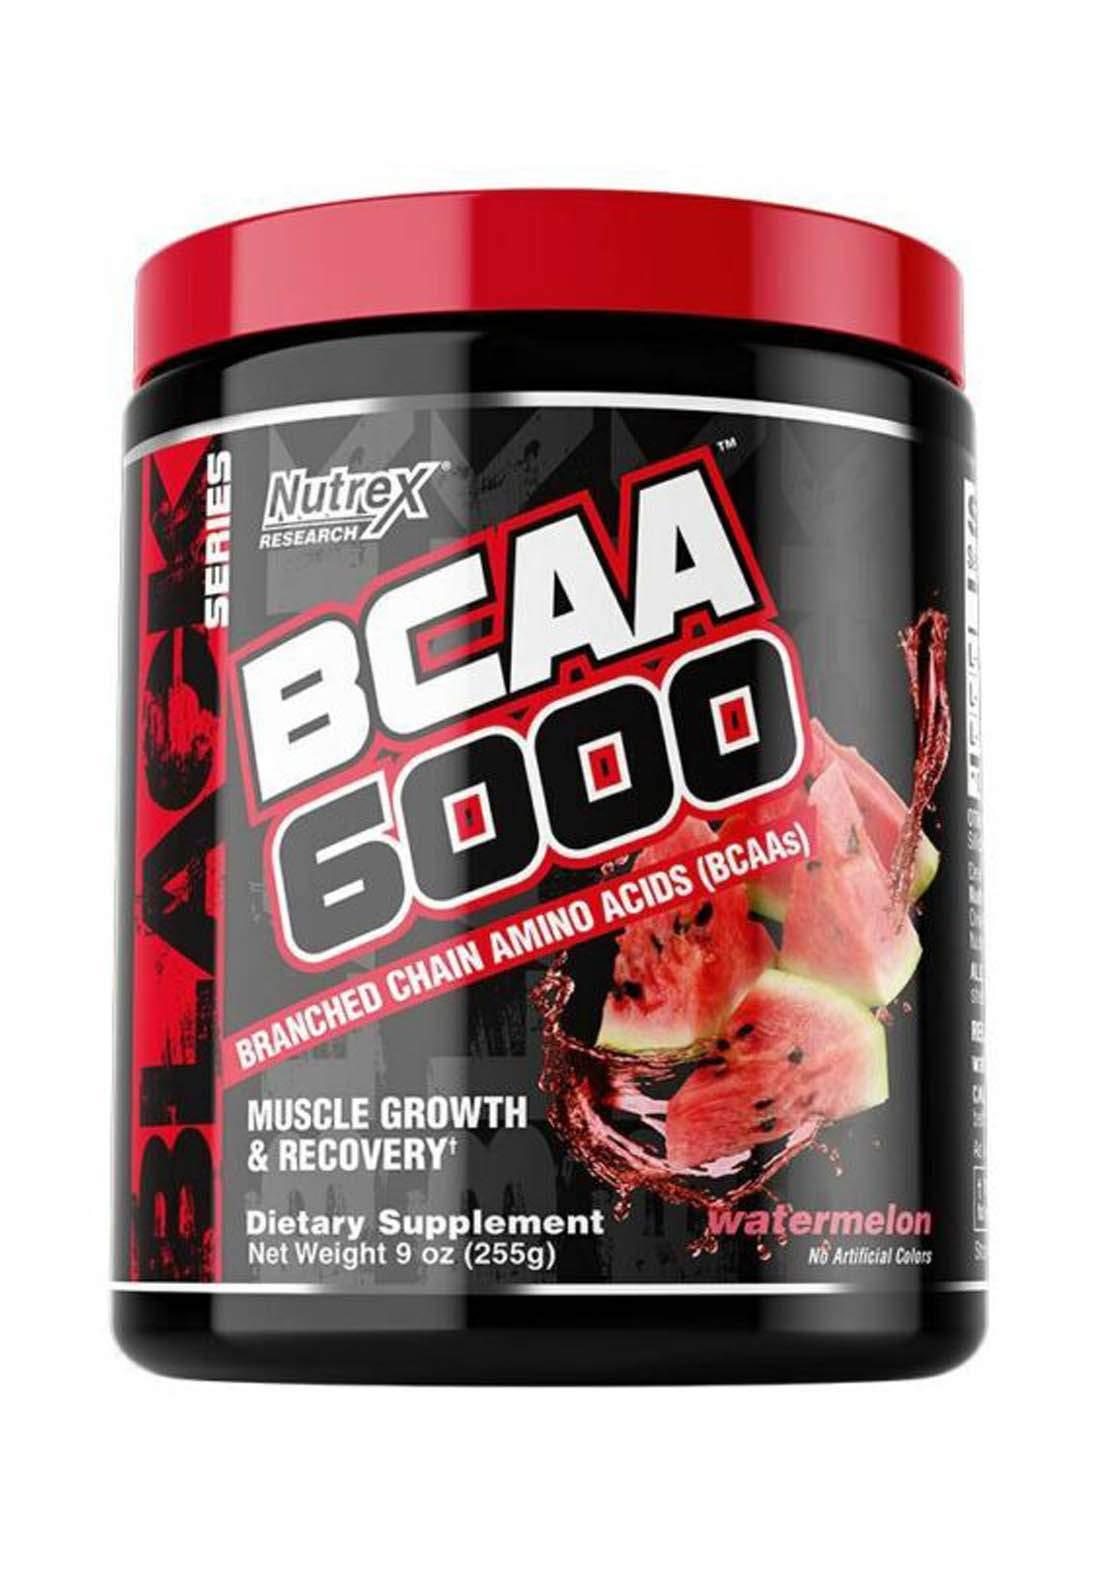 Nutrex Research BCAA 6000 Muscles Growth & Recovery Watermelon 30 Serv 255 Ml مكمل احماض امينية